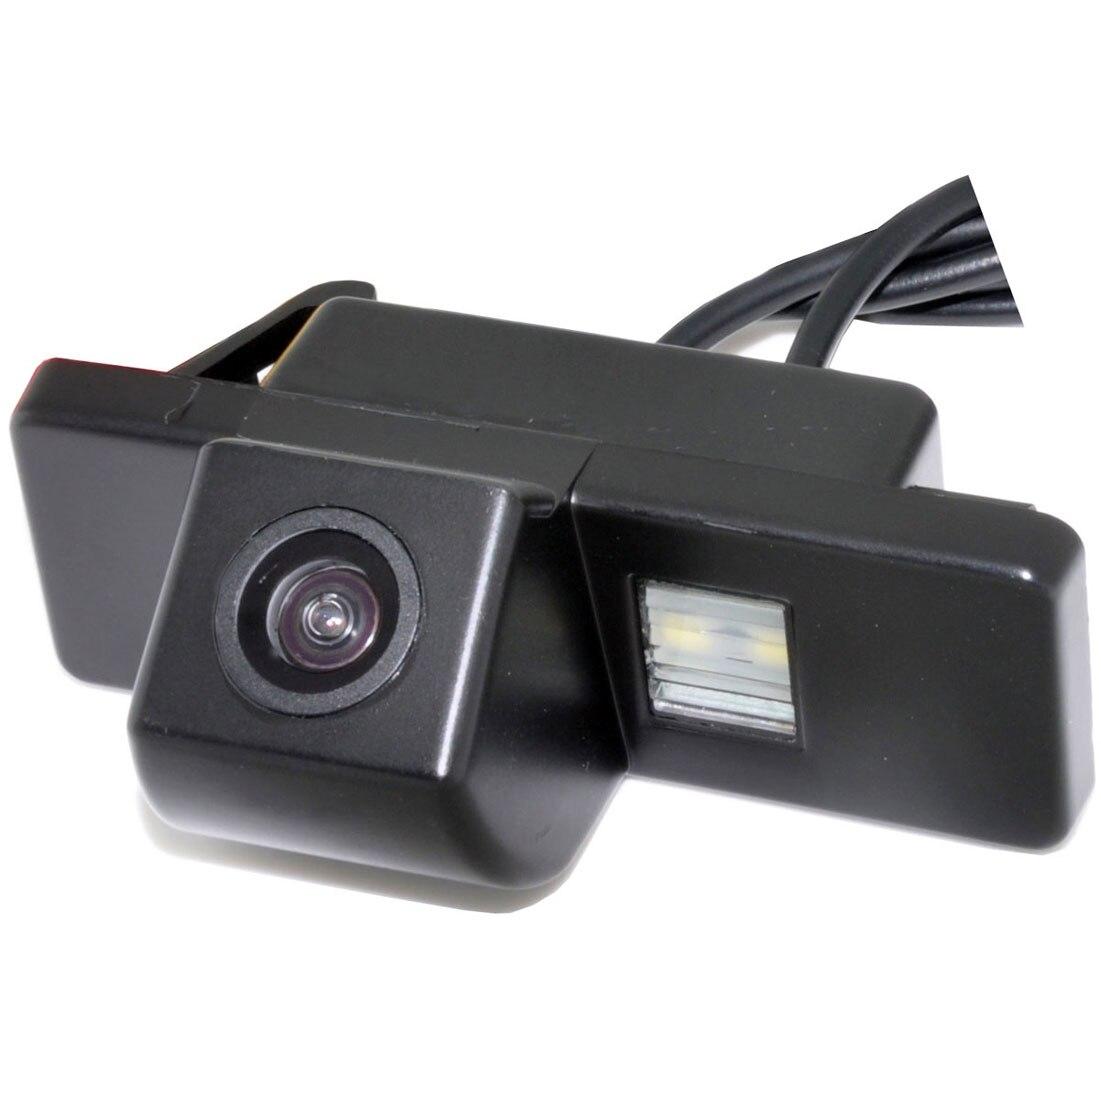 HD CCD araba arka görüş kamerası Nissan QASHQAI için X-TRAIL genesis Citroen C4 C5 c-triomphe Peugeot 307cc pathfinder Dualis